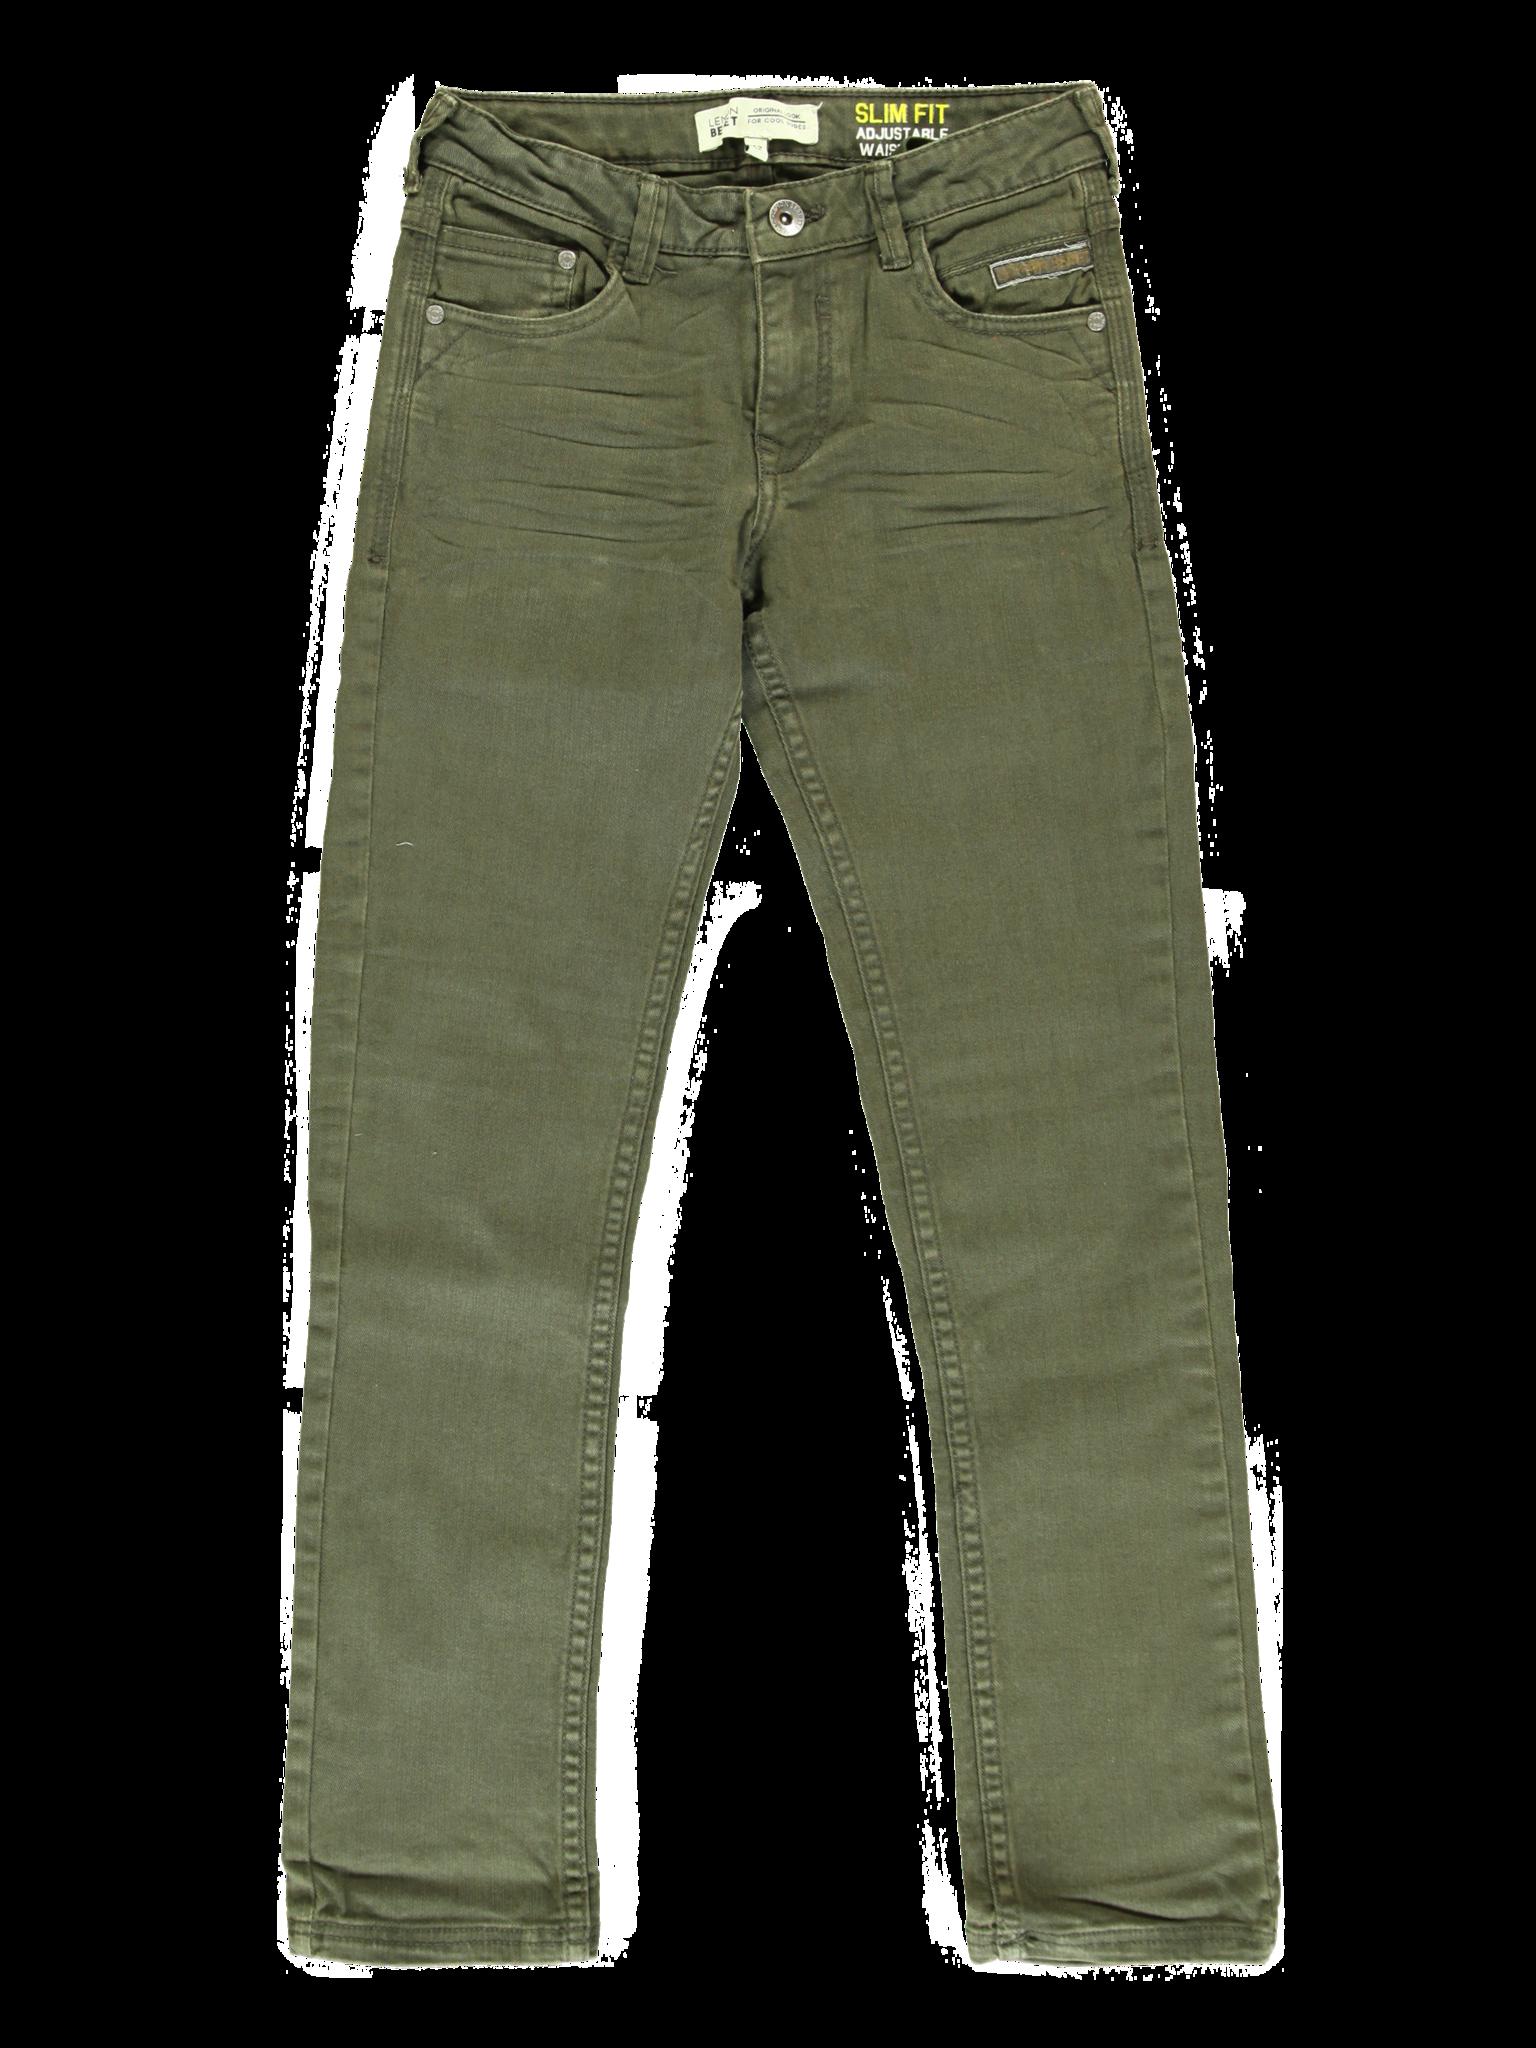 All Brands   Winterproducts Teen Boys   Pants   10 pcs/box